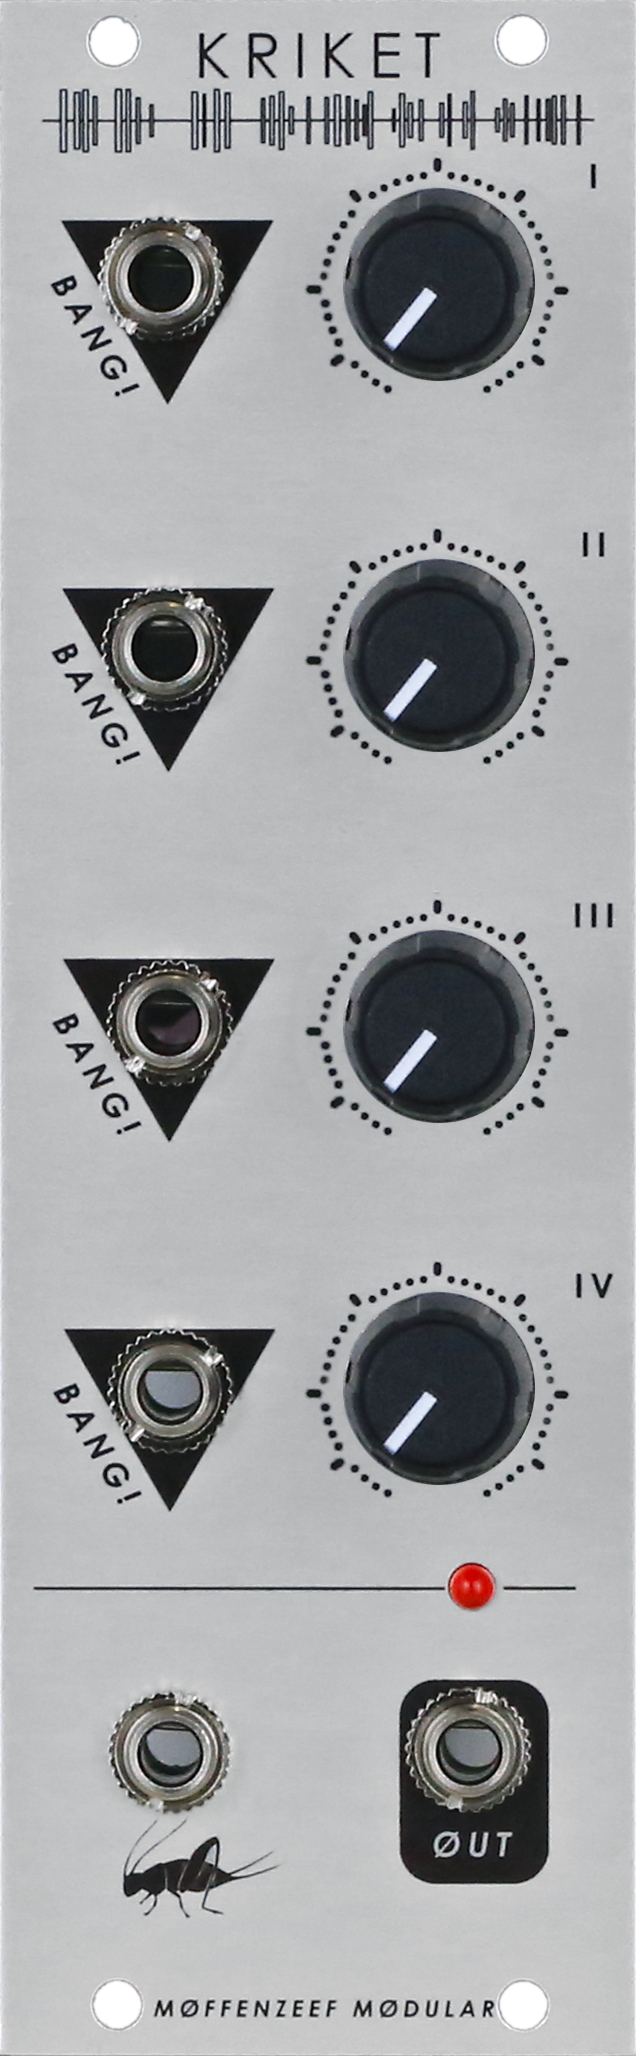 eurorack, eurorack modular, drum module, glitch, noise, synth, industrial, aggressive, distortion, CV, control voltage, error, digital, analog, kriket, moffenzeef, moffenzeef modular, synthesizer, modular synthesizer